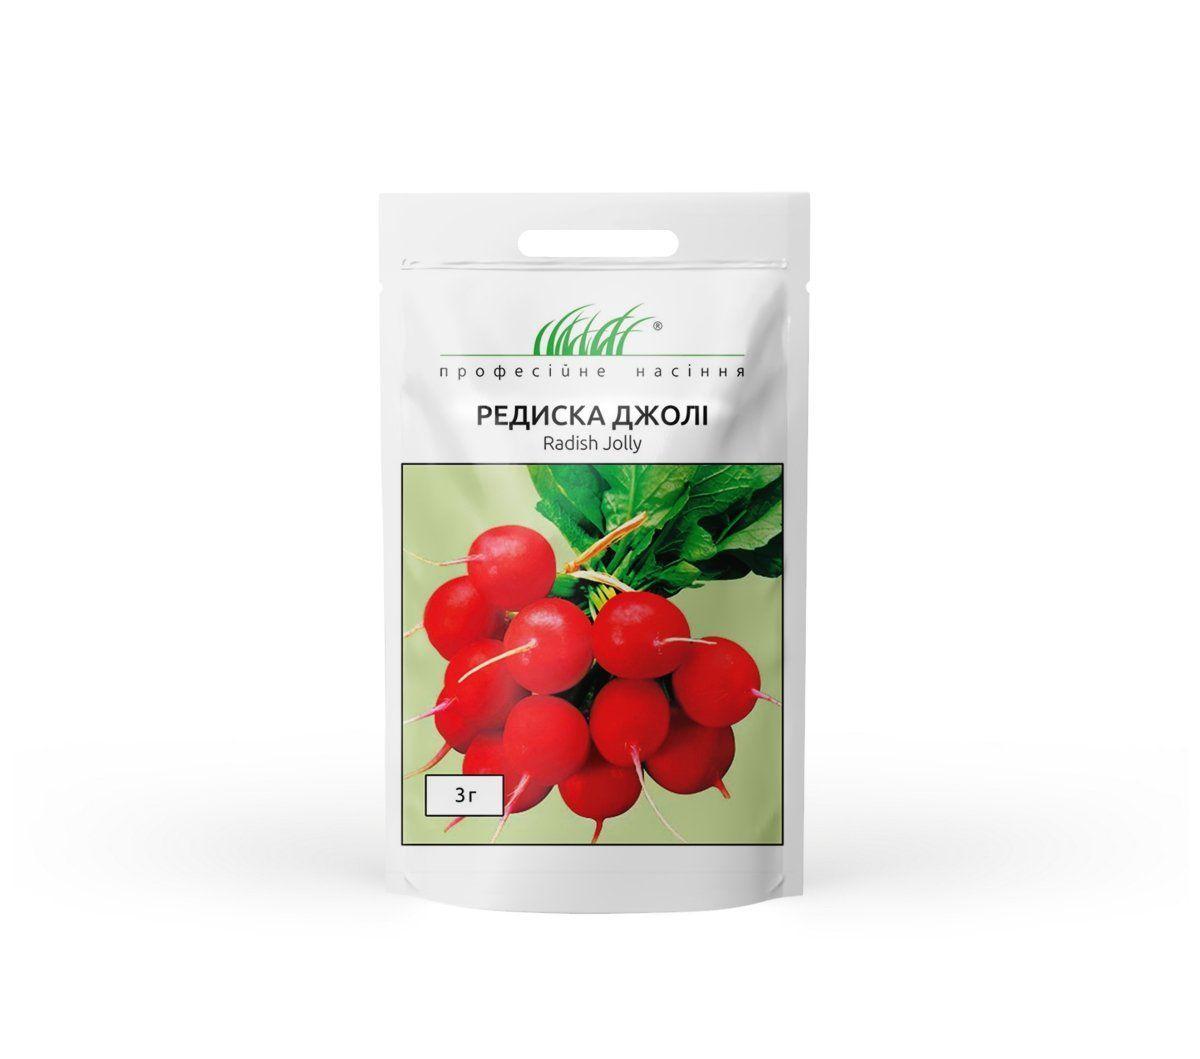 Джолли семена редиски, 3 г — редис, ранний,  Clause